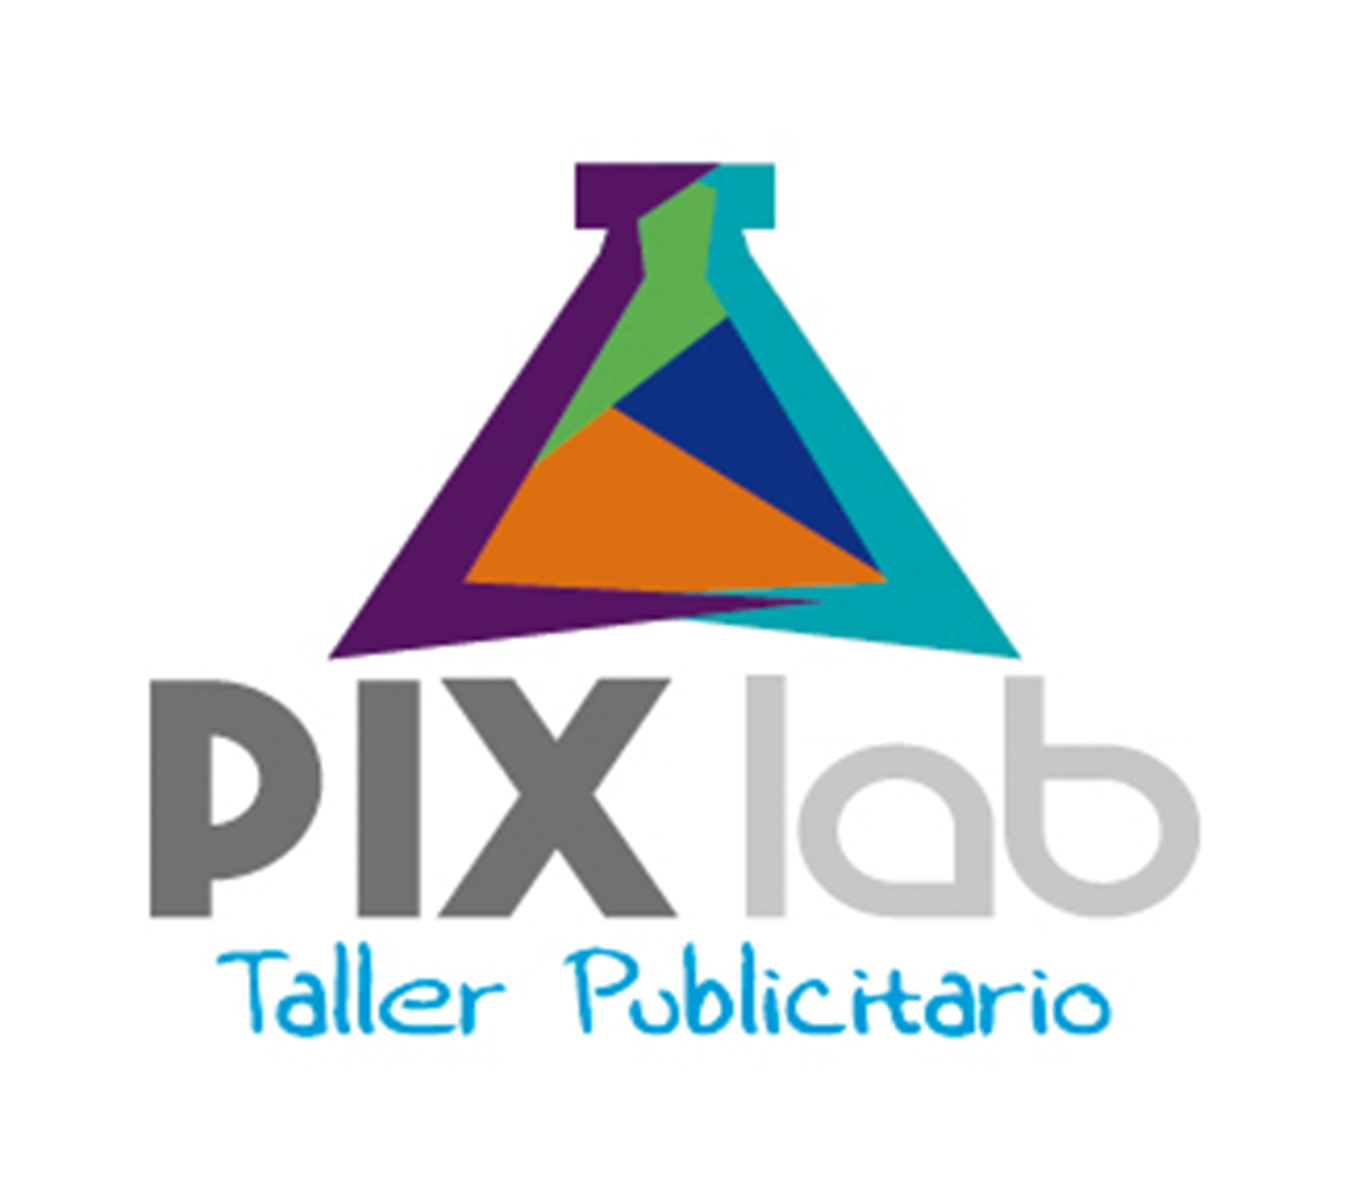 PixLab